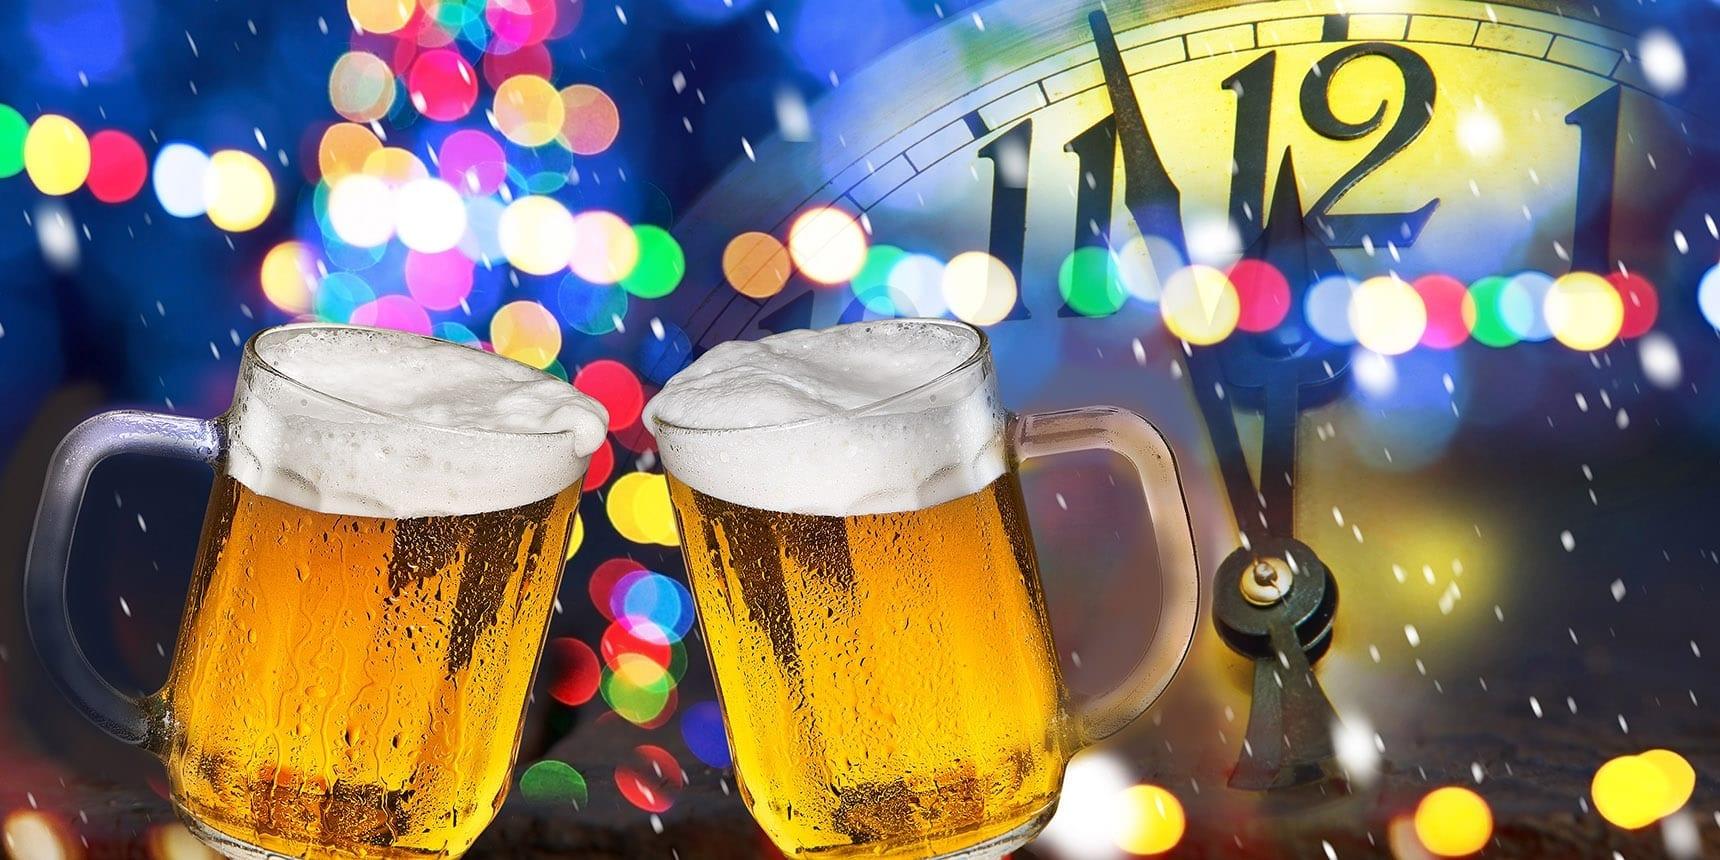 Utah Beer News - 2019 in Review